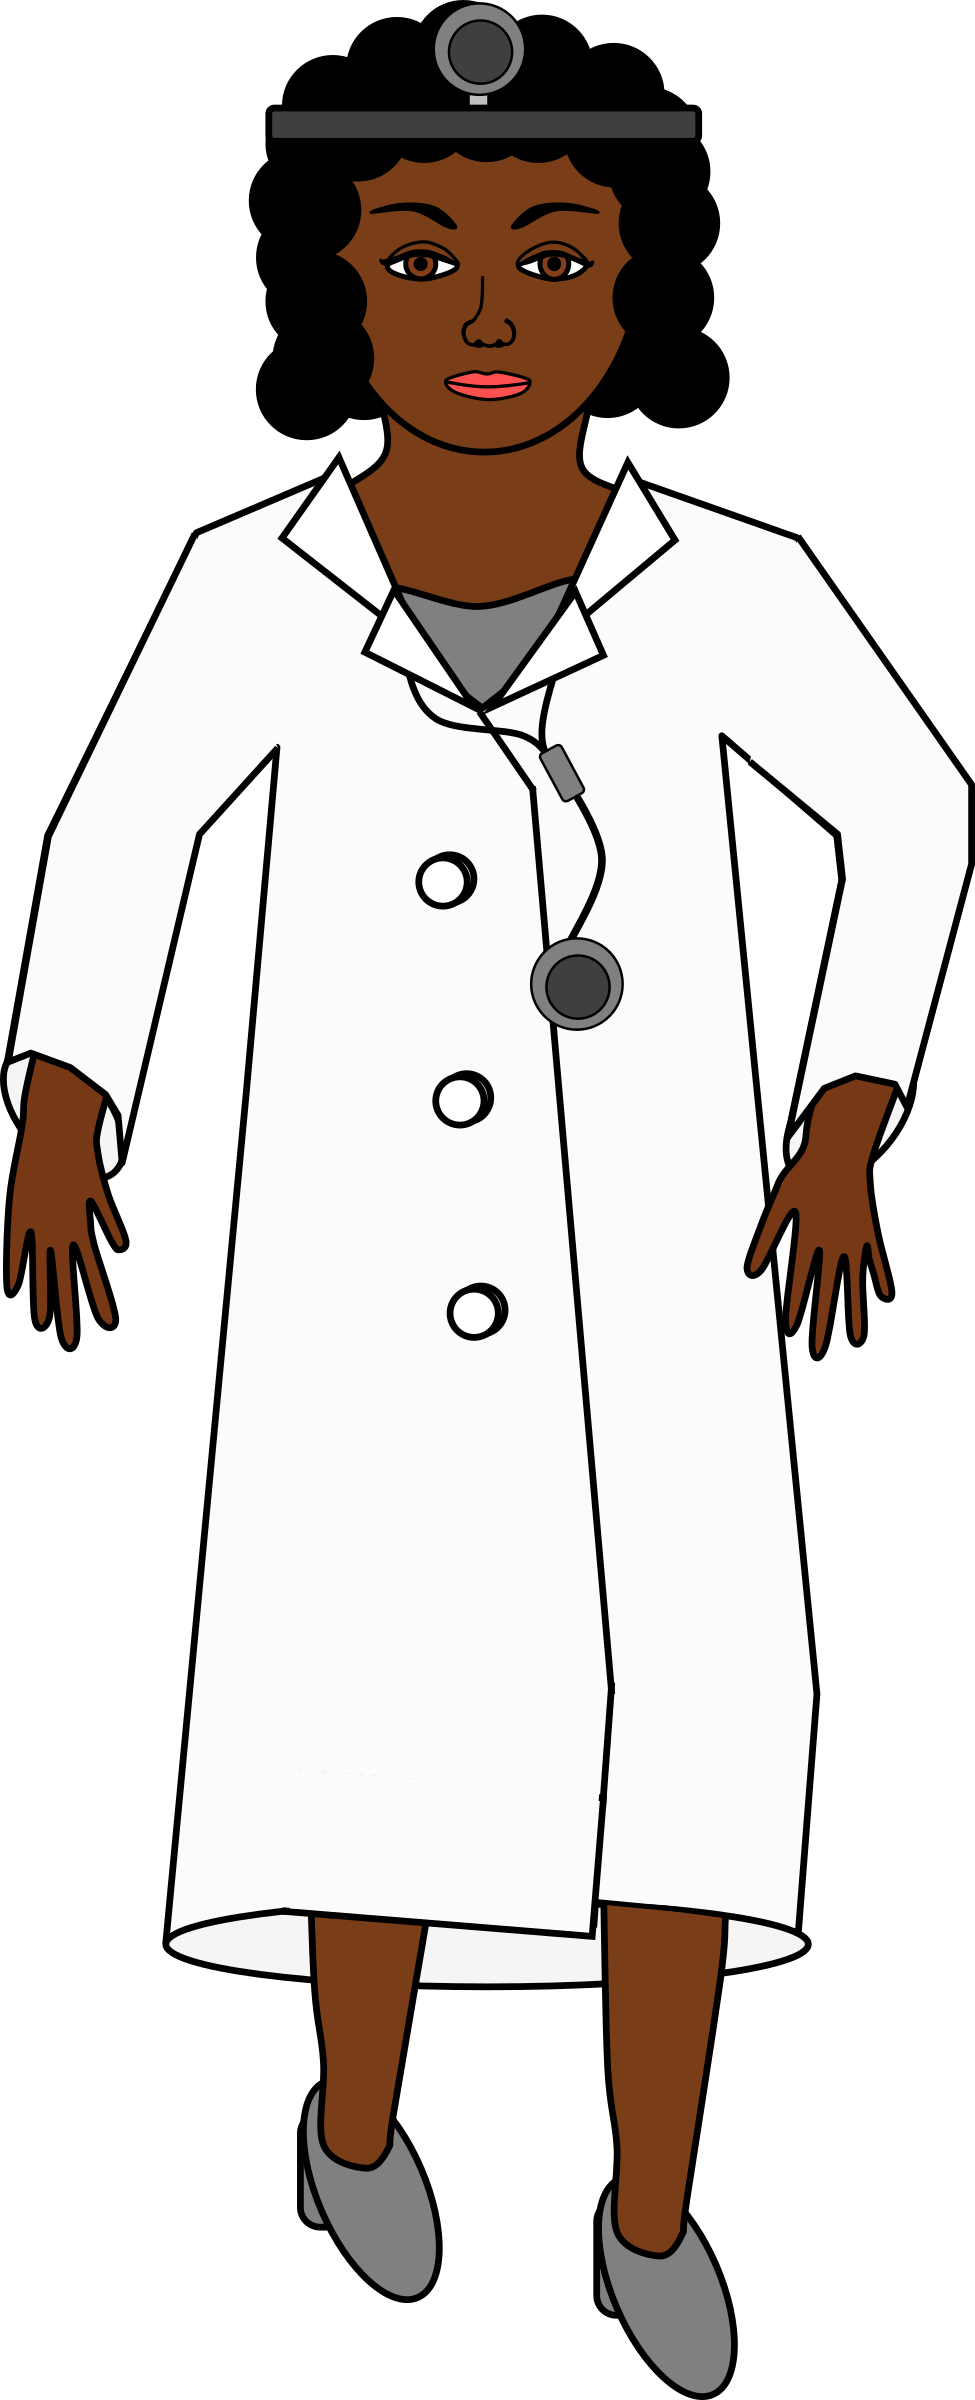 Physician African American Clip art.